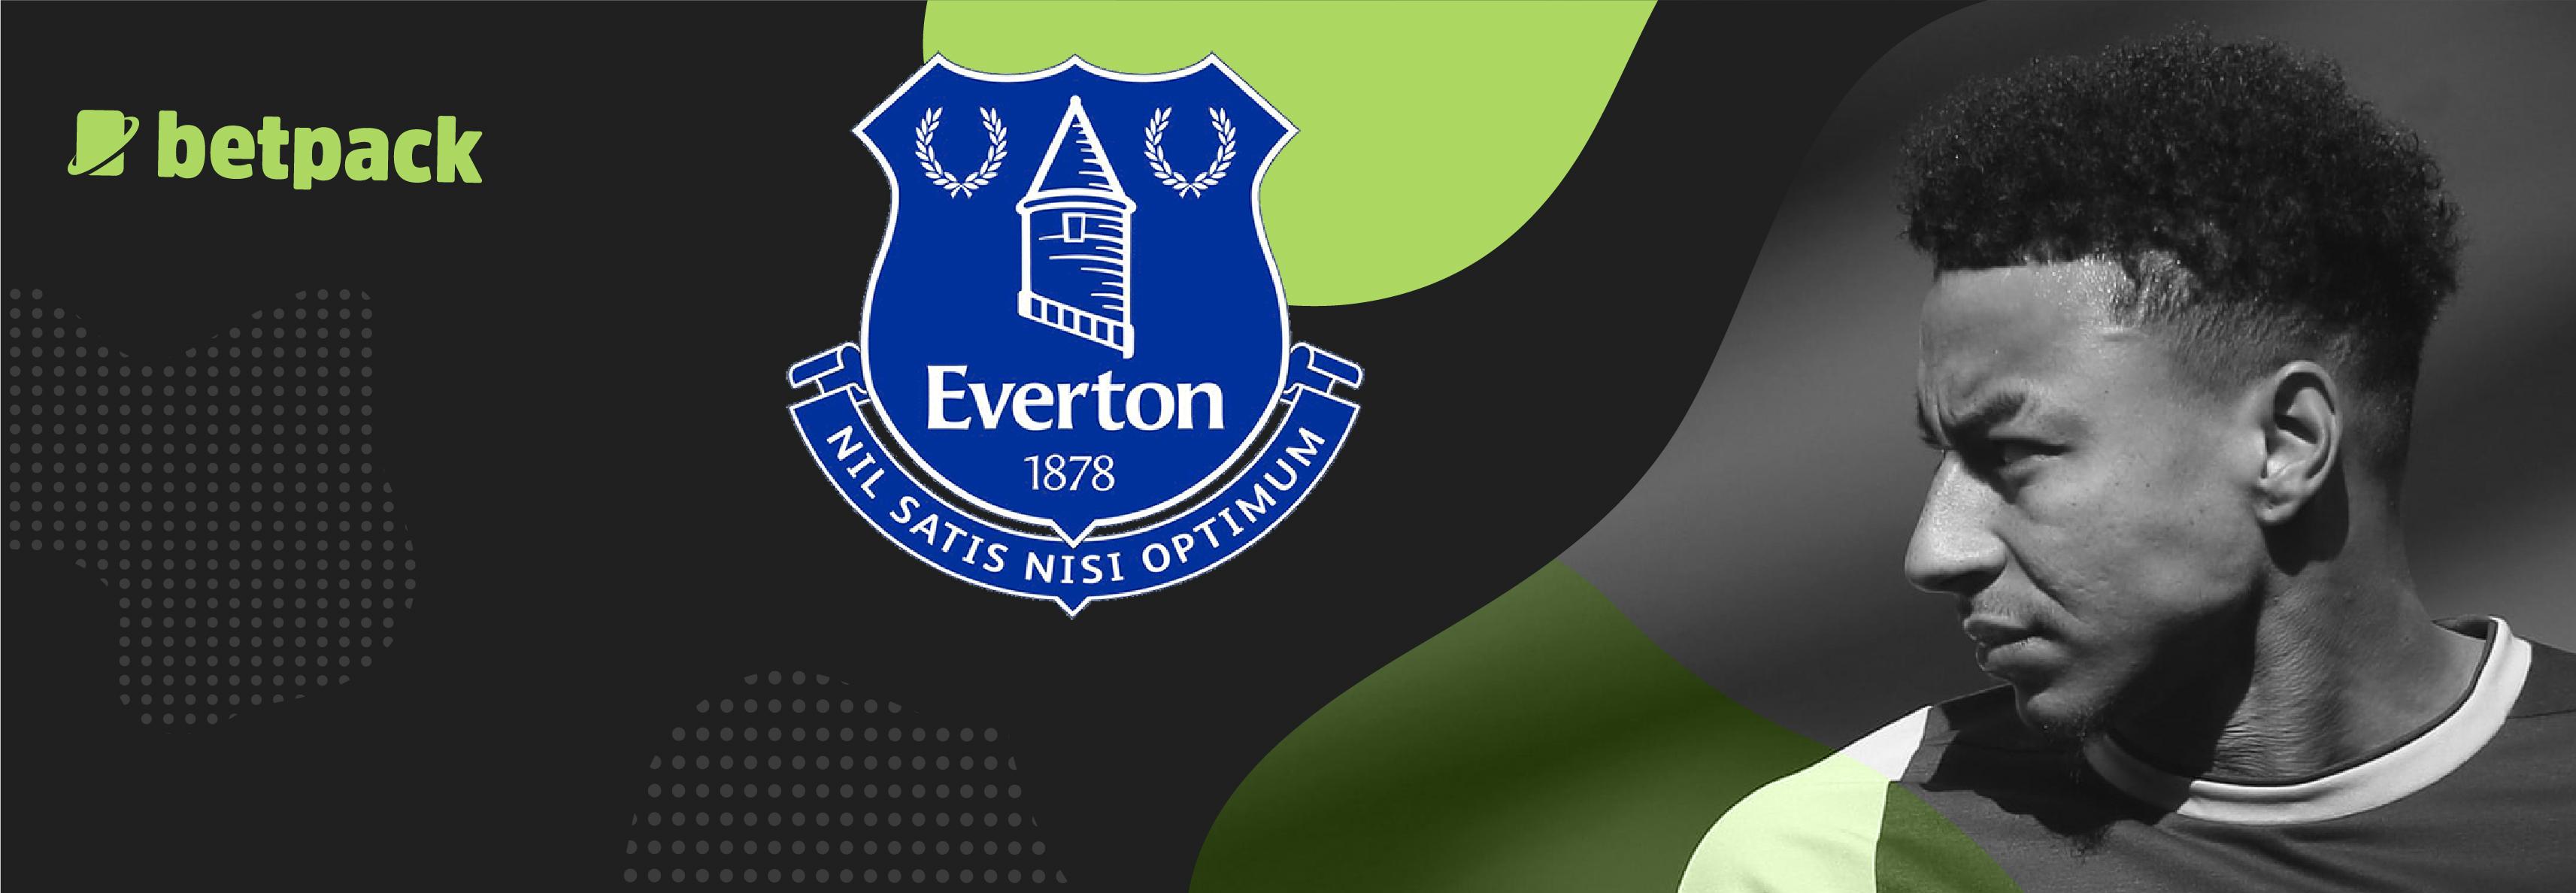 Everton looking to bring Jesse Lingard to Merseyside